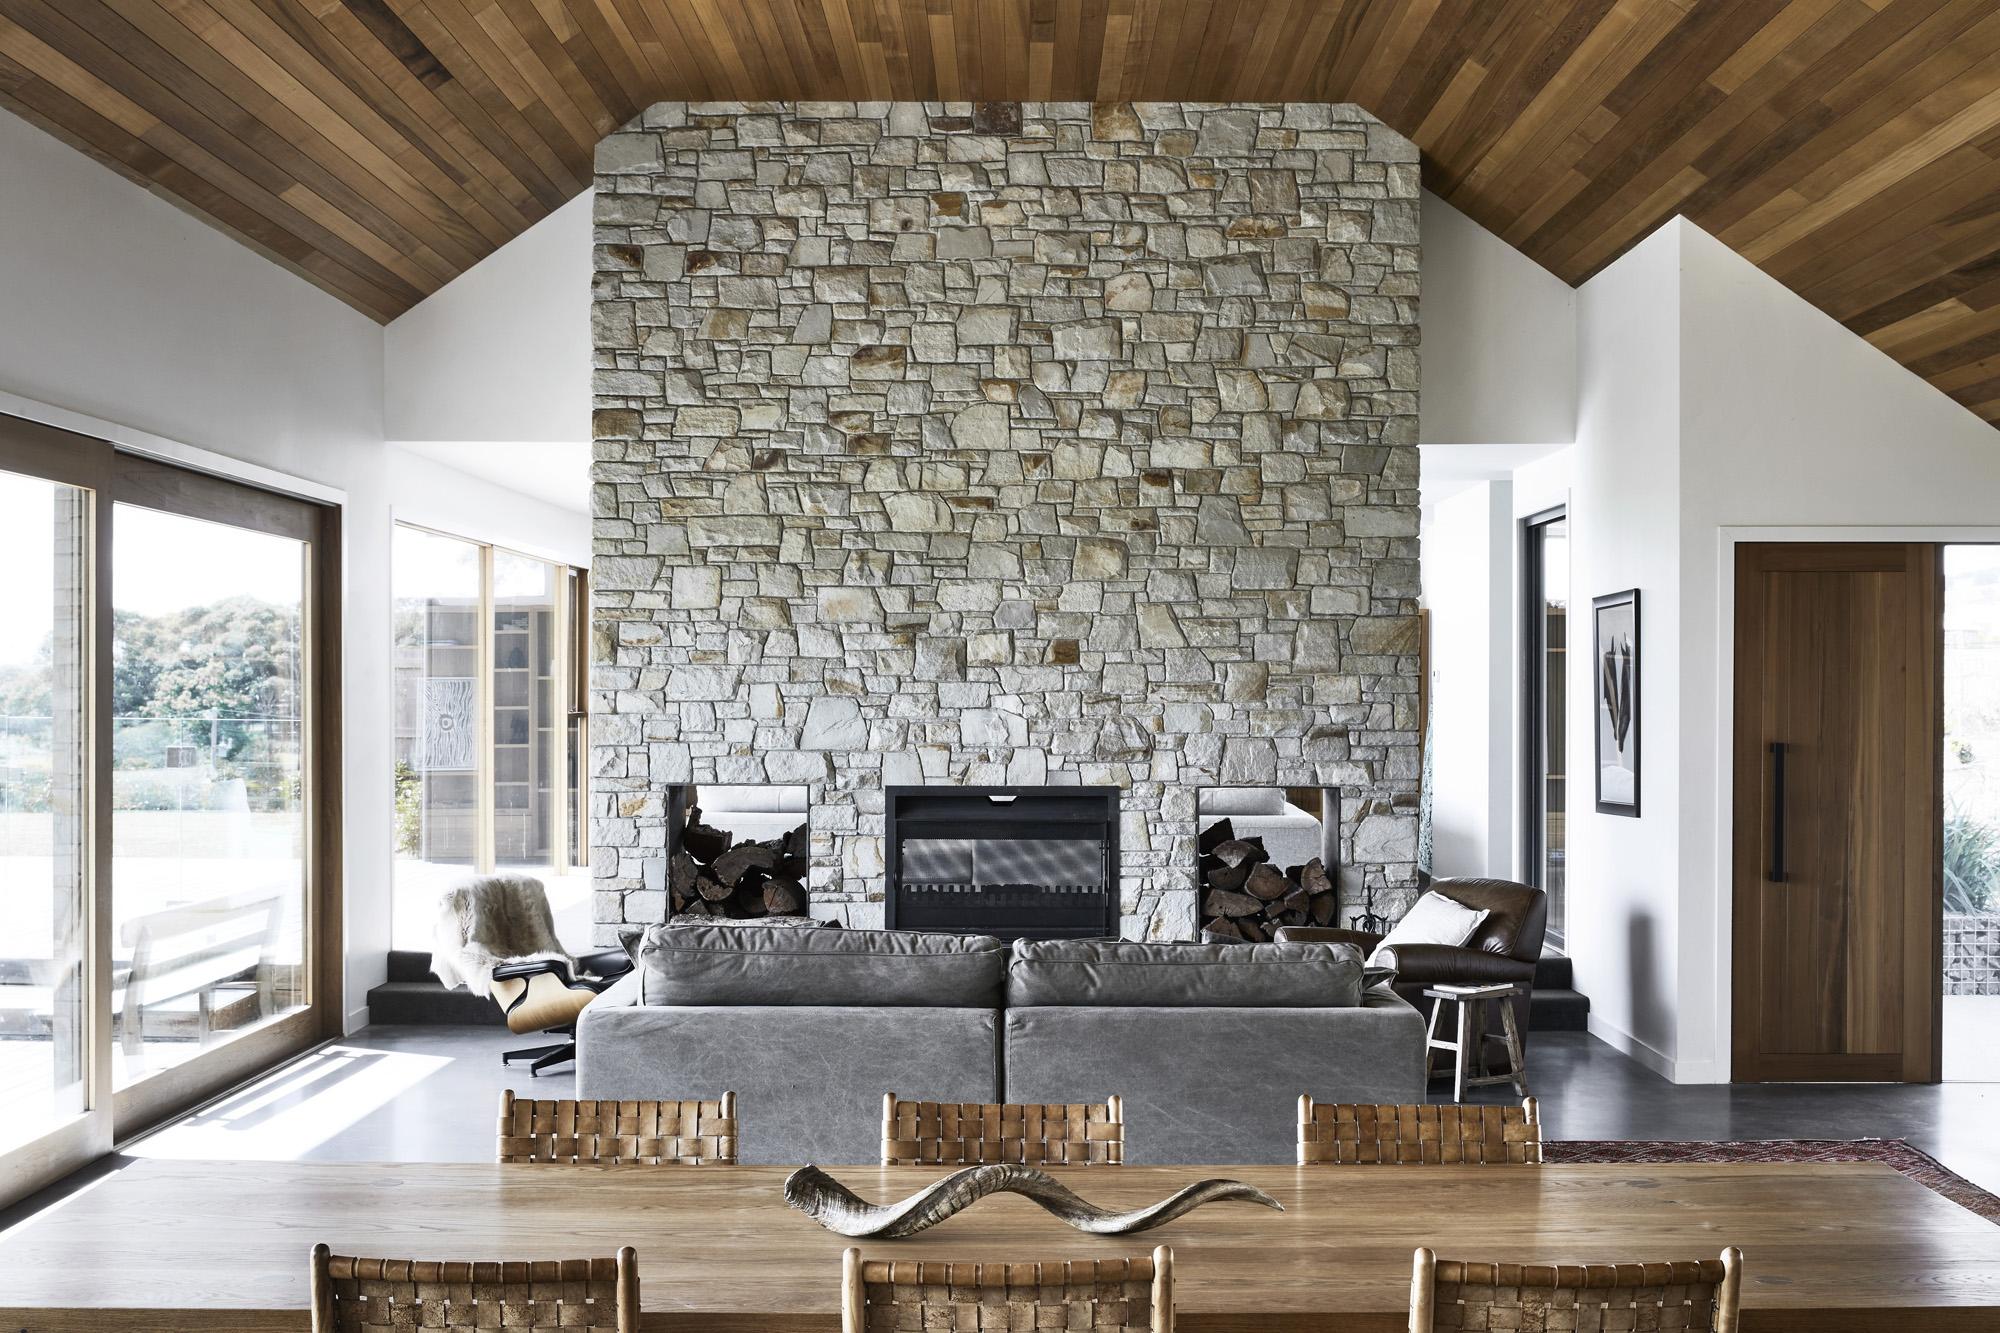 Dan Gayfer Design - MINI Australia - Feature Intervew - Australian Architecture - Ceres House, Victoria - Image 4